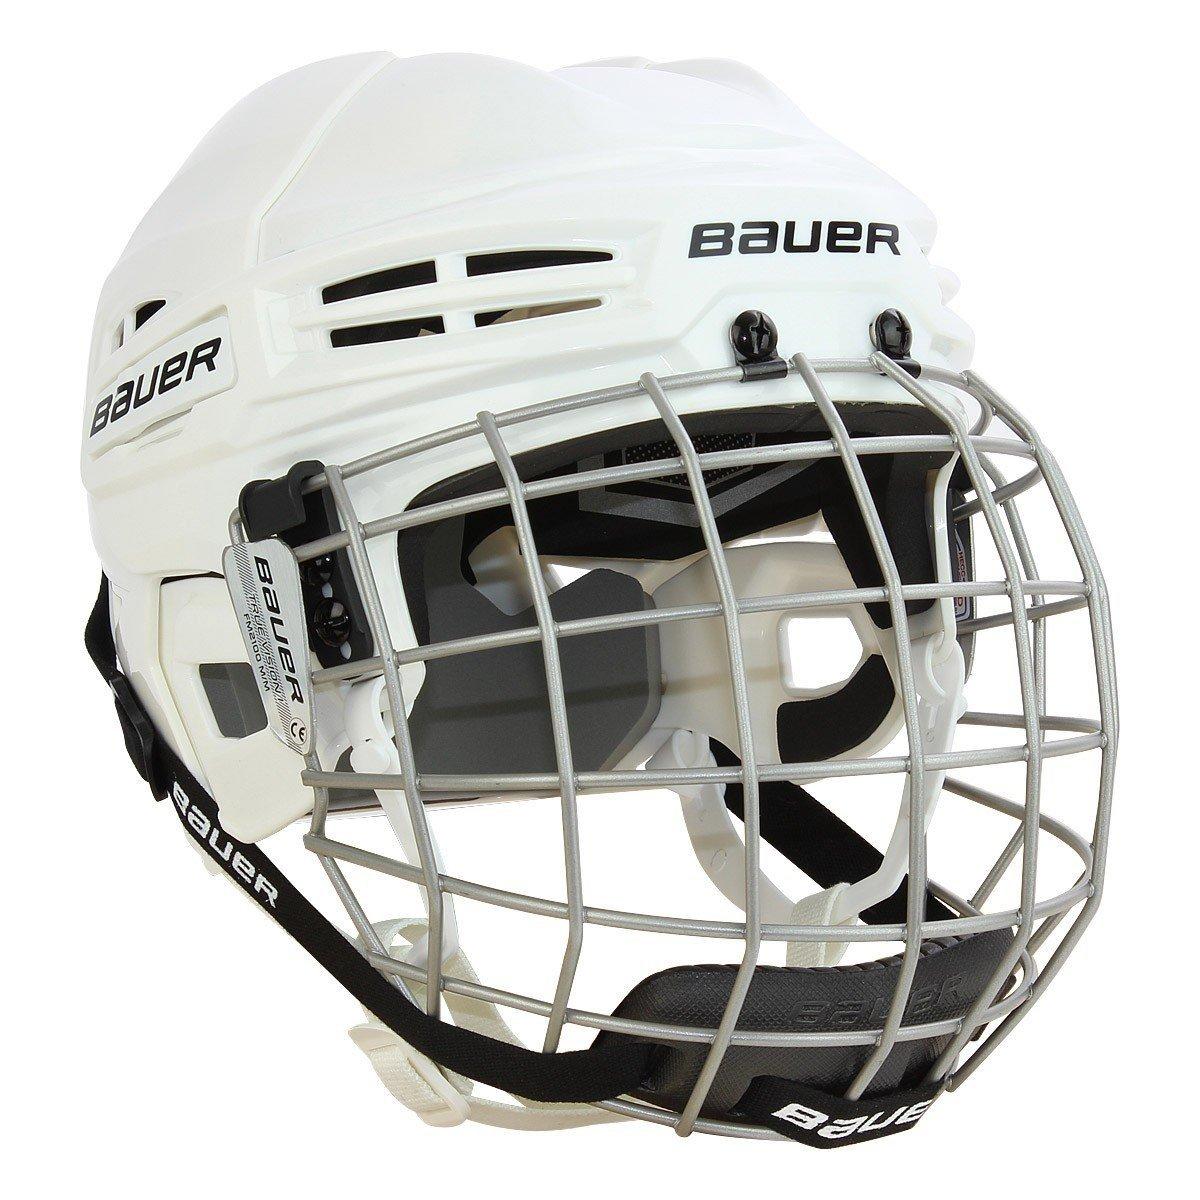 3d5c2cc0901 Amazon.com   Bauer IMS 5.0 Helmet Combo   Sports   Outdoors